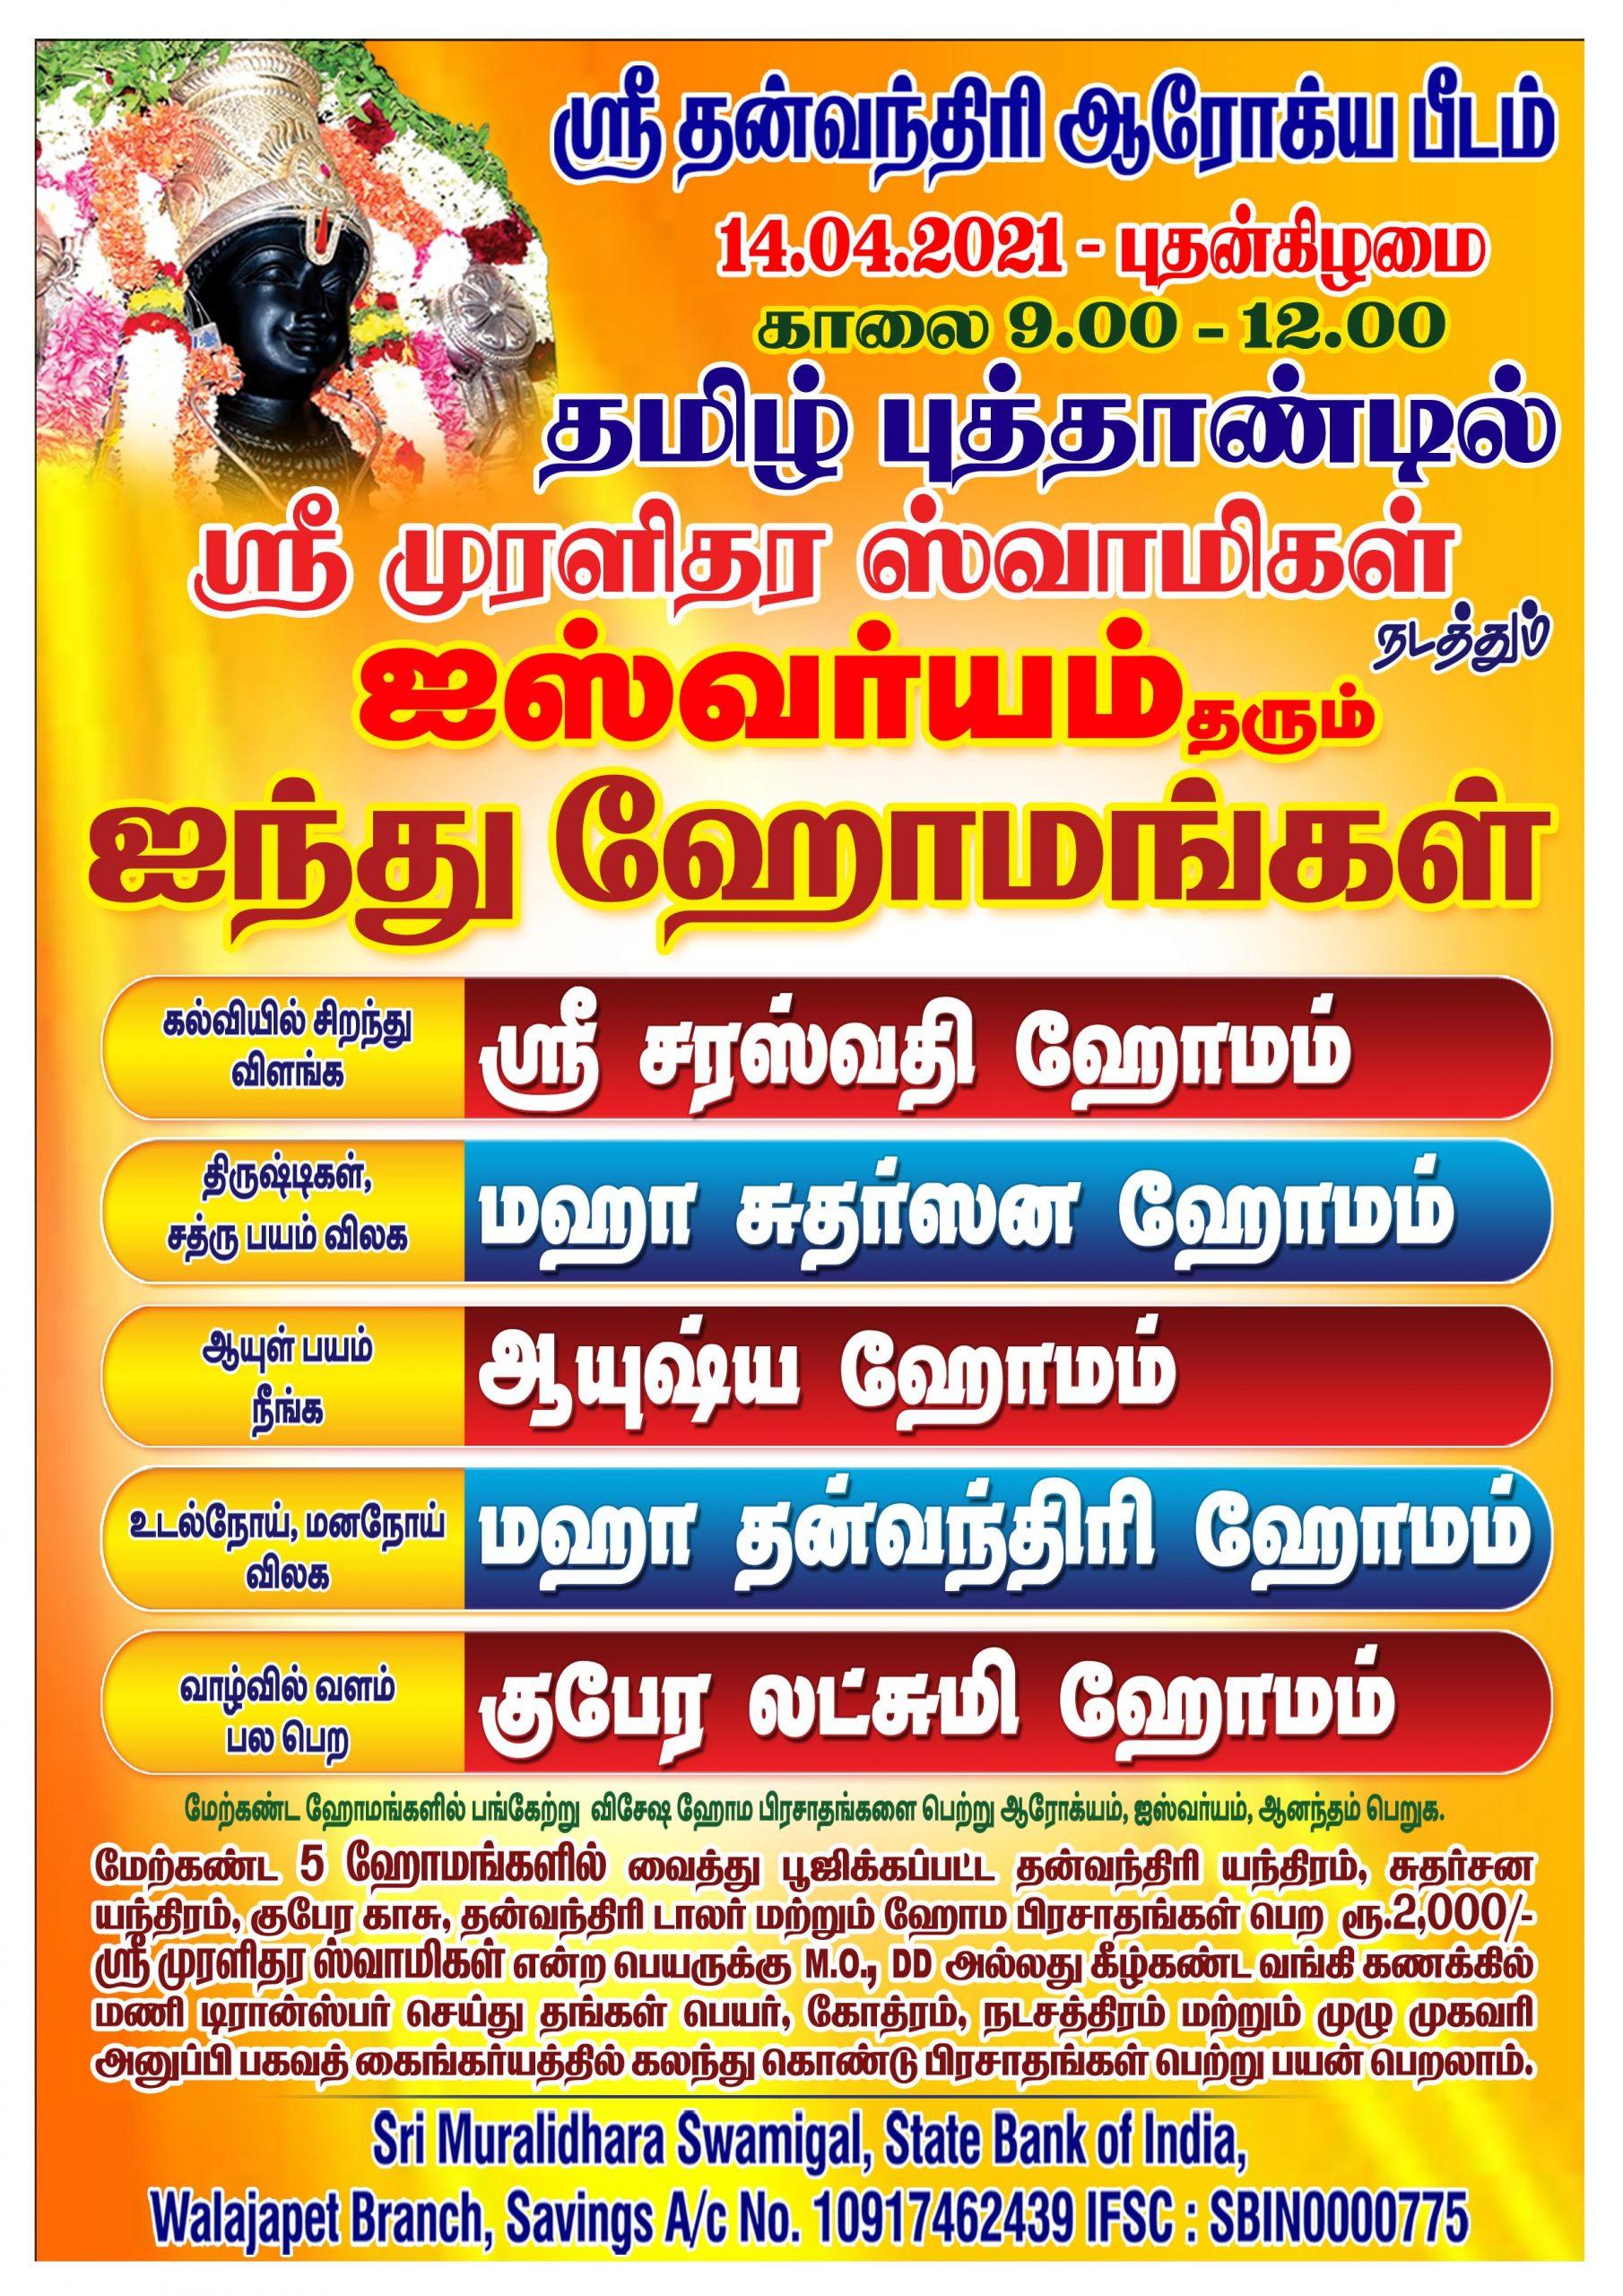 Sri Danvantri Arogya Peedam – Sri Muralidhara Swamigal